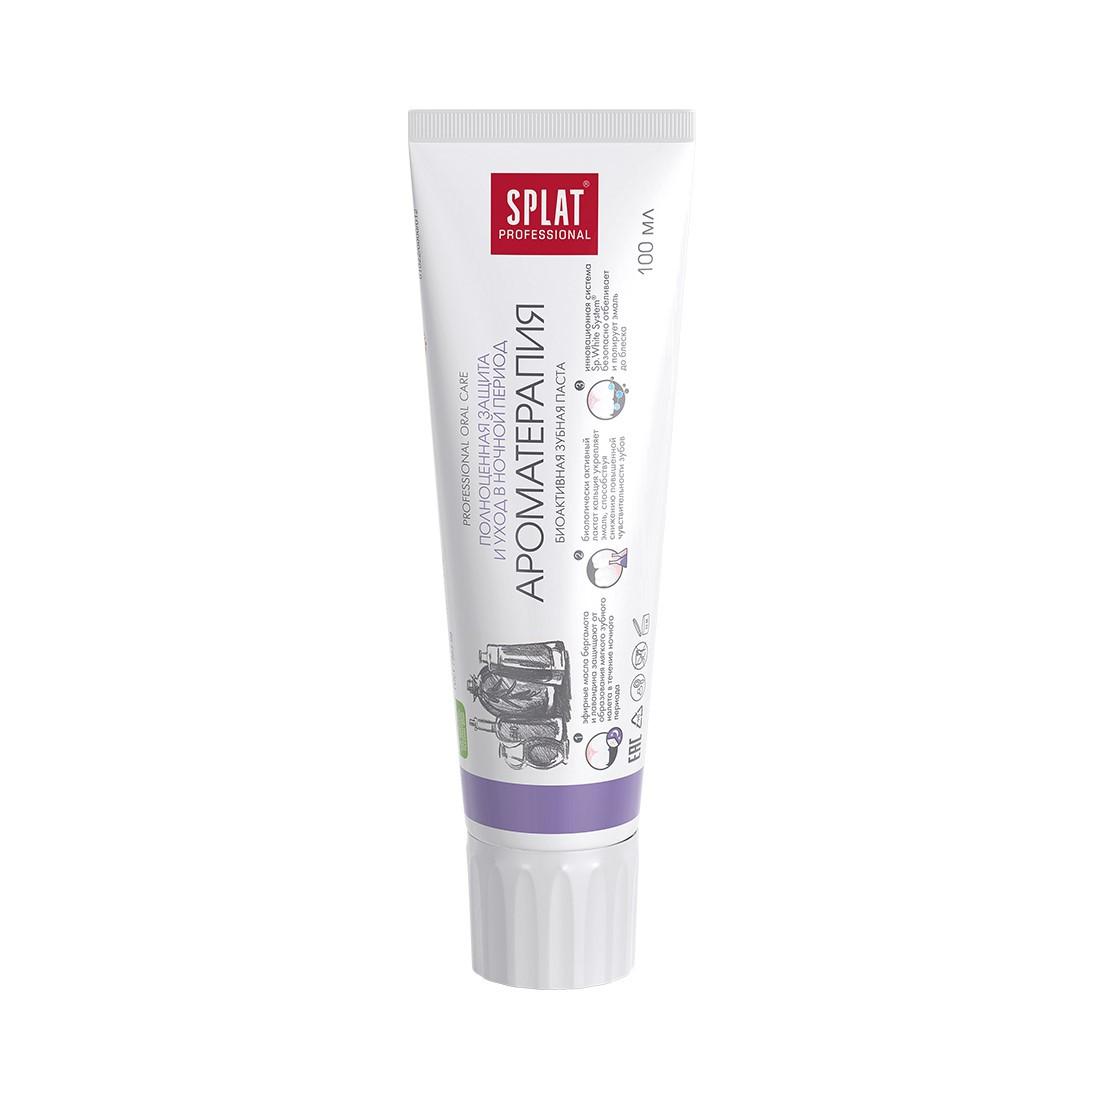 Біоактивна зубна паста Splat Professional Ароматерапія, 100мл